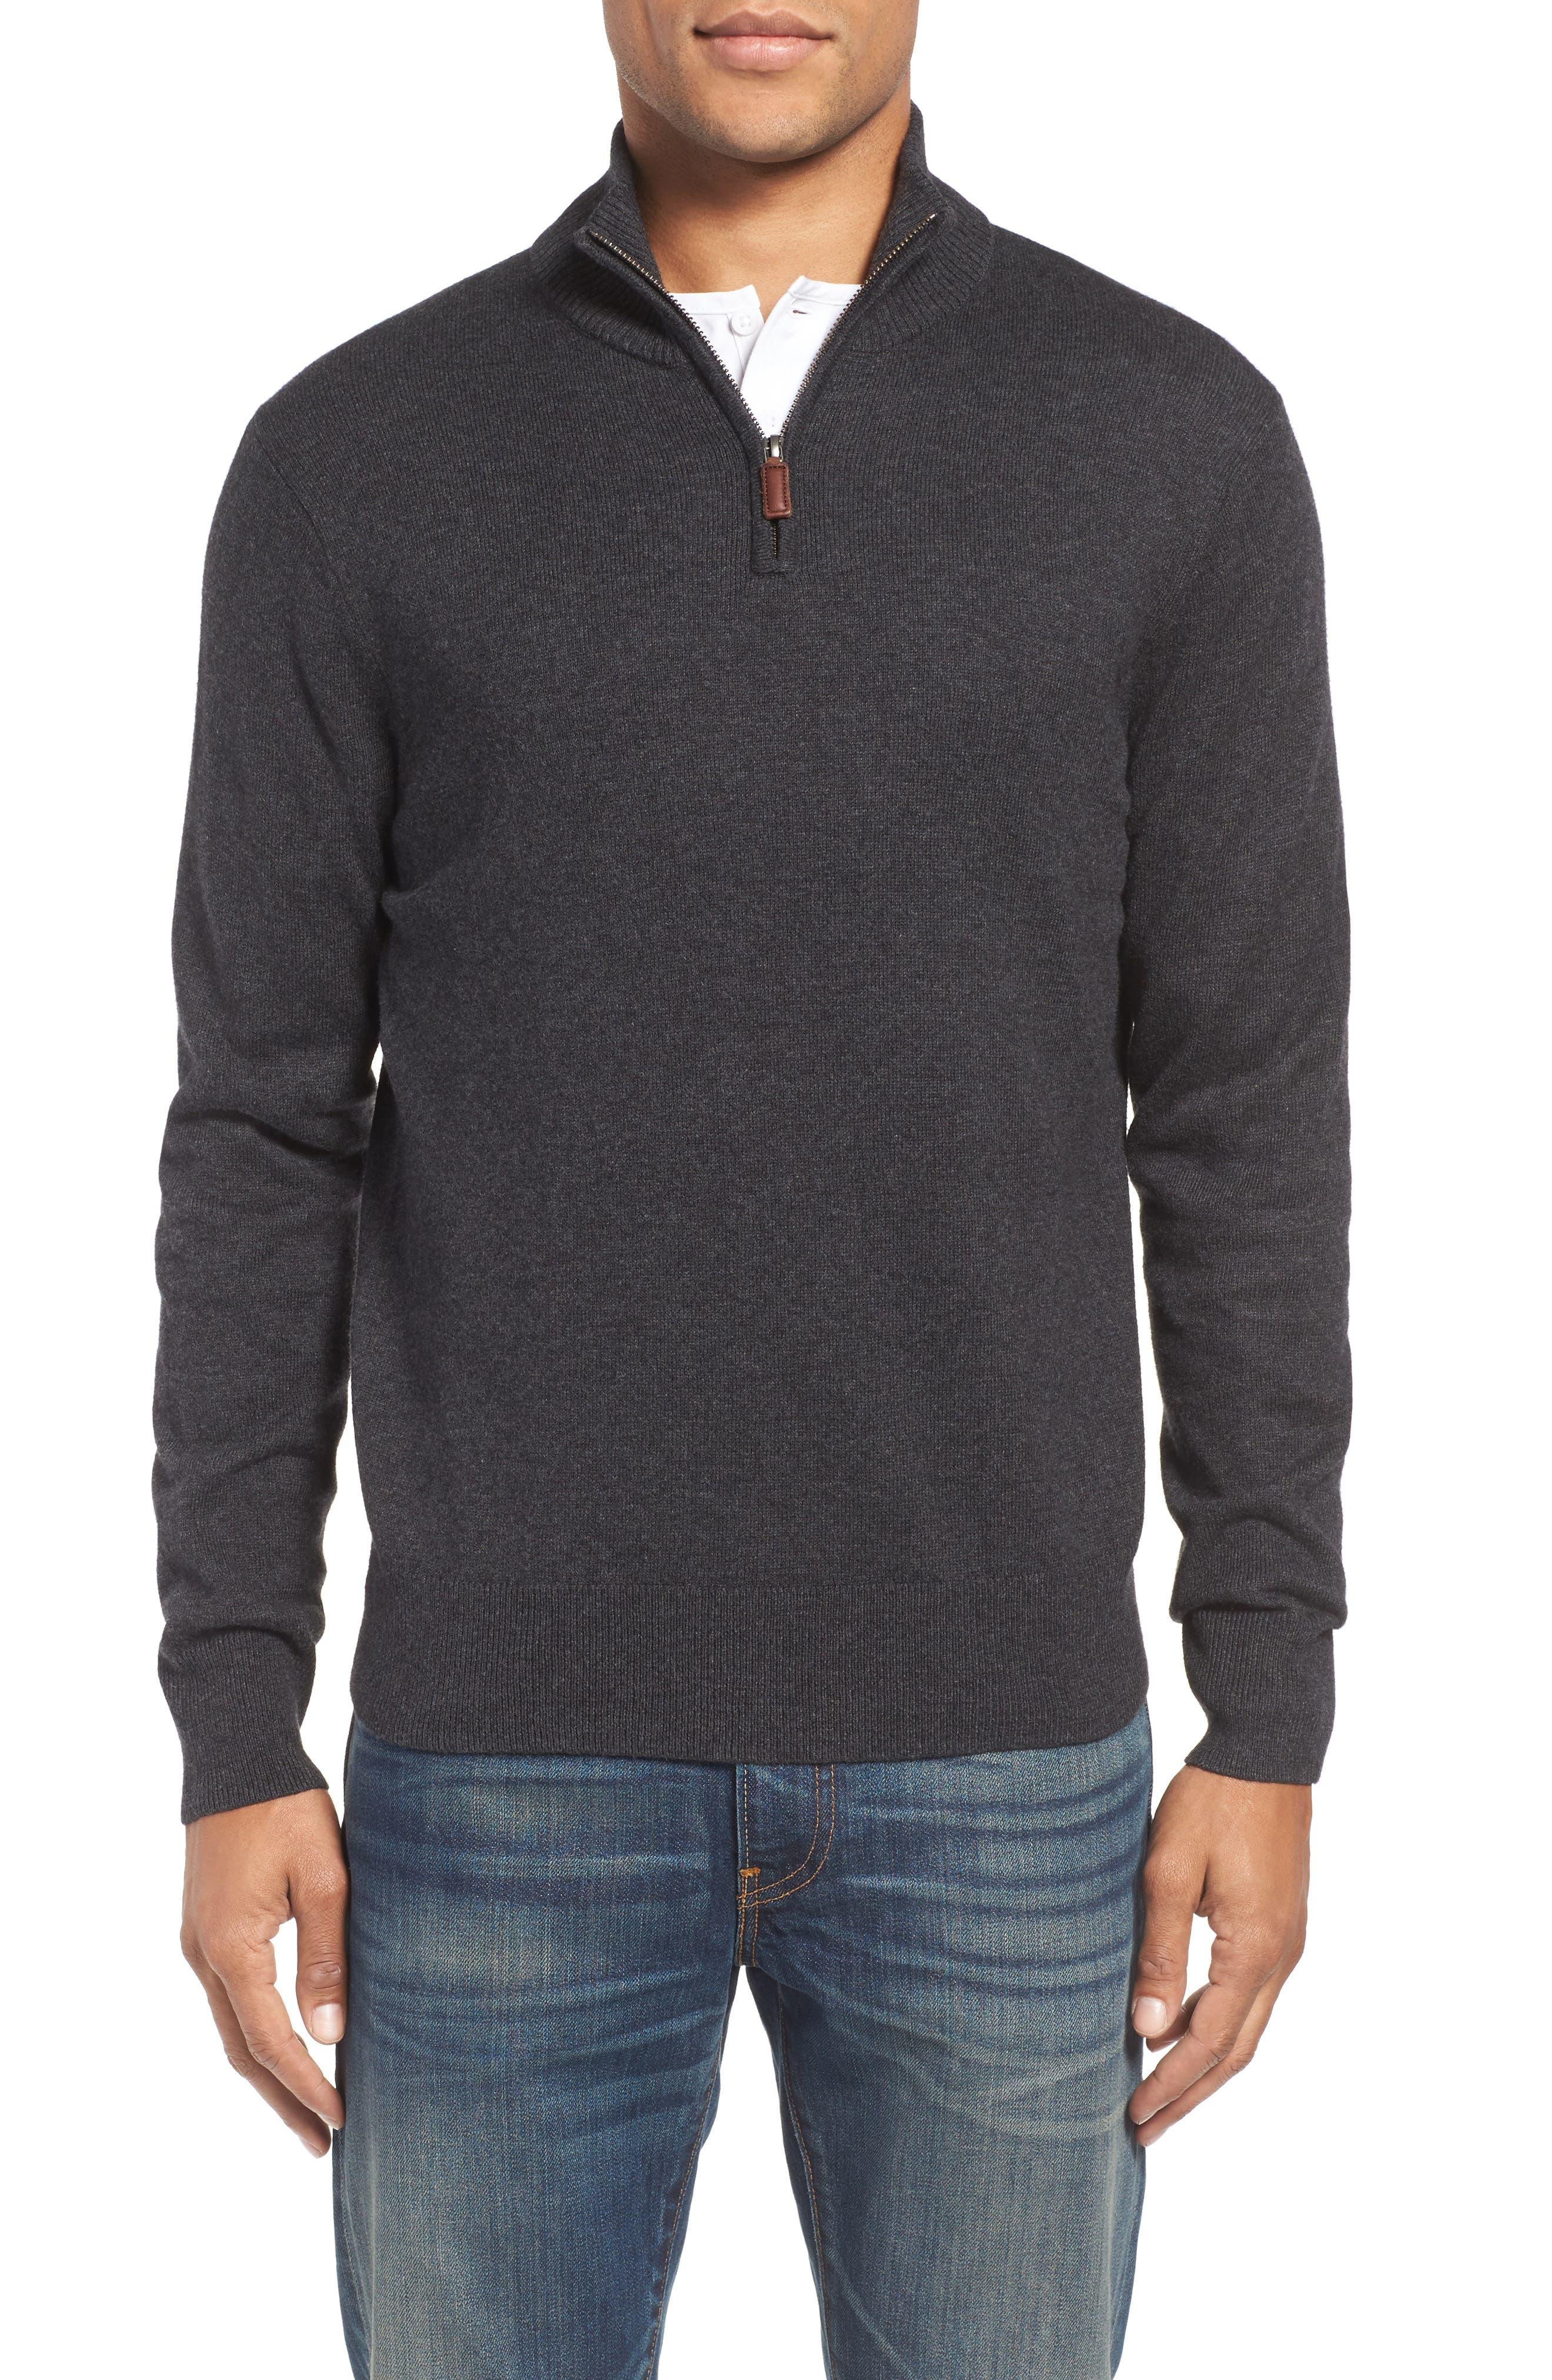 Main Image - Bonobos Cotton & Cashmere Quarter Zip Sweater